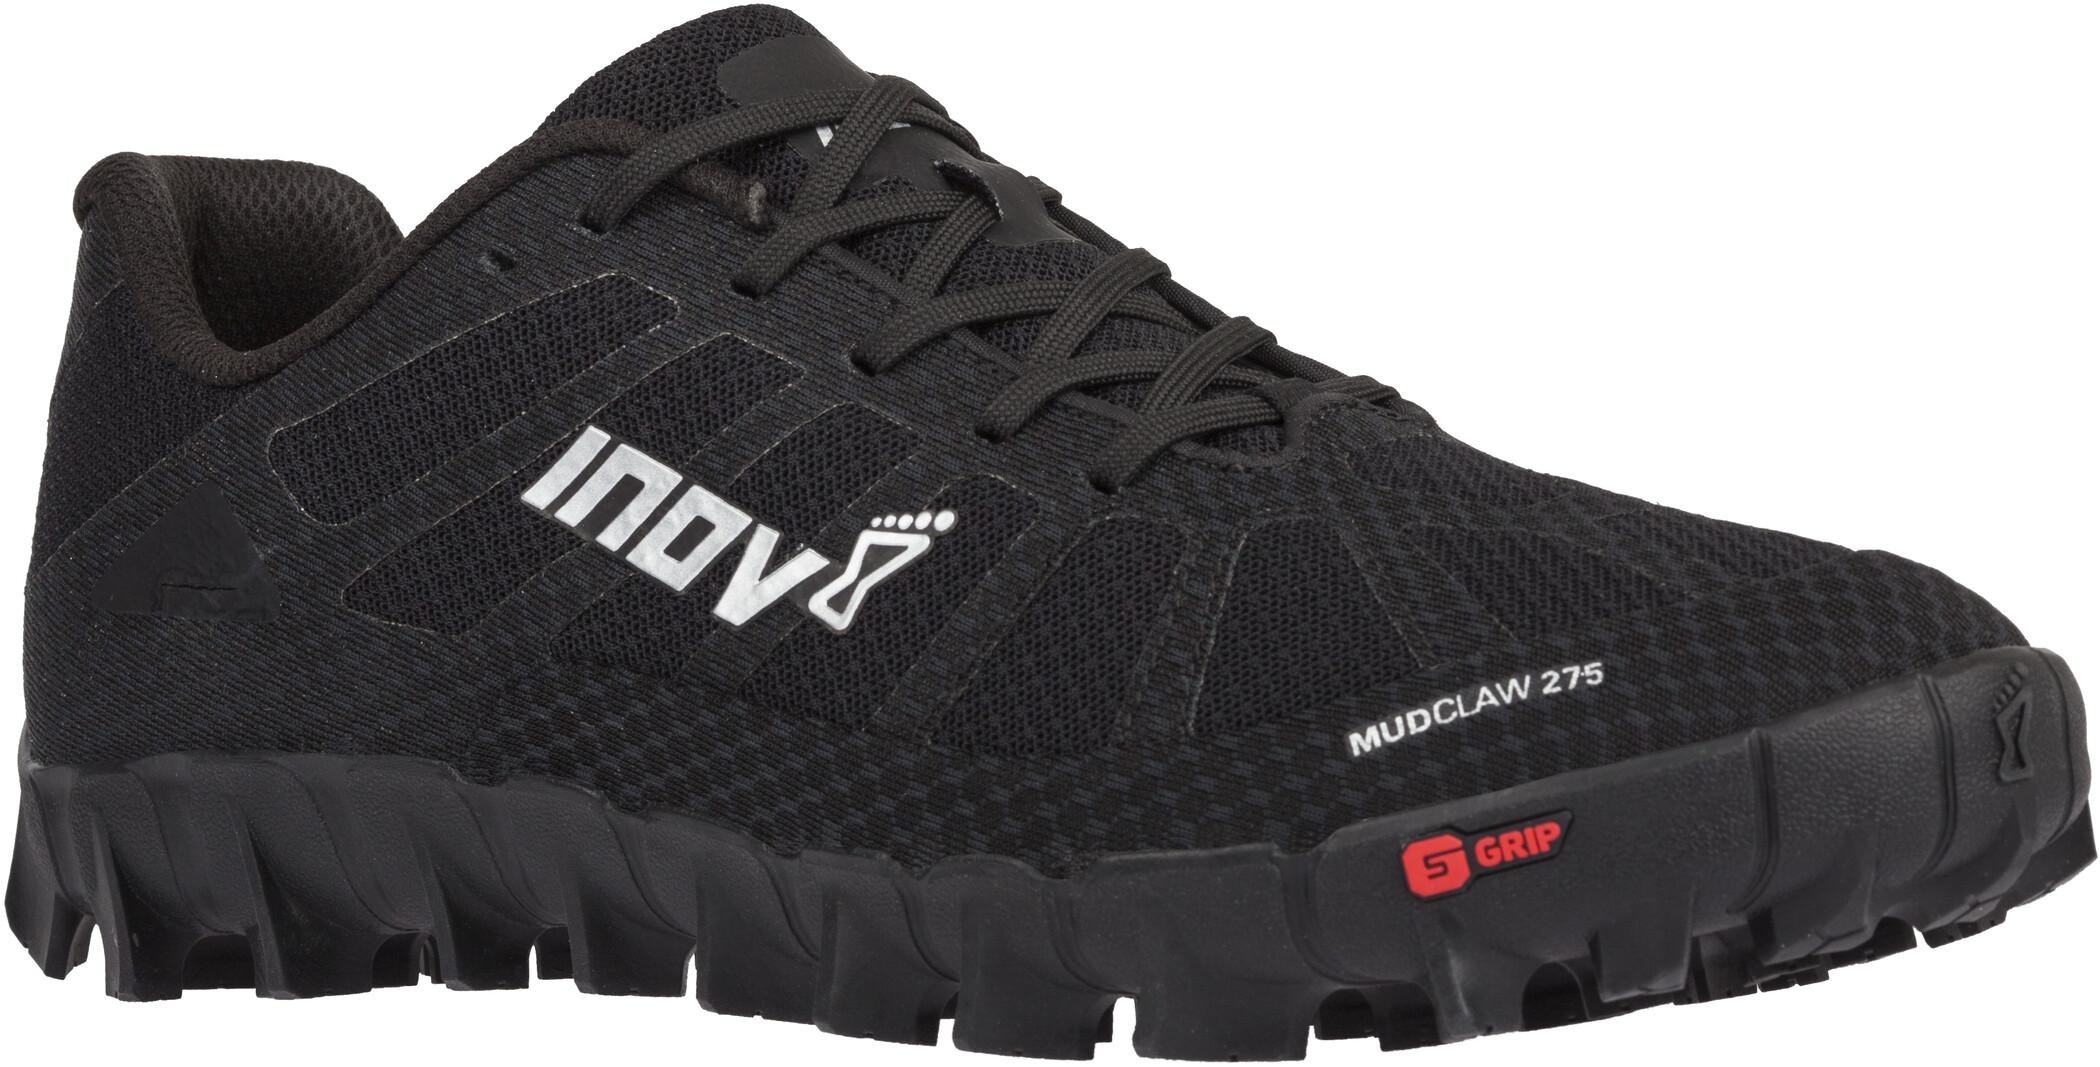 inov-8 Mudclaw 275 Løbesko, black/silver (2019)   Running shoes